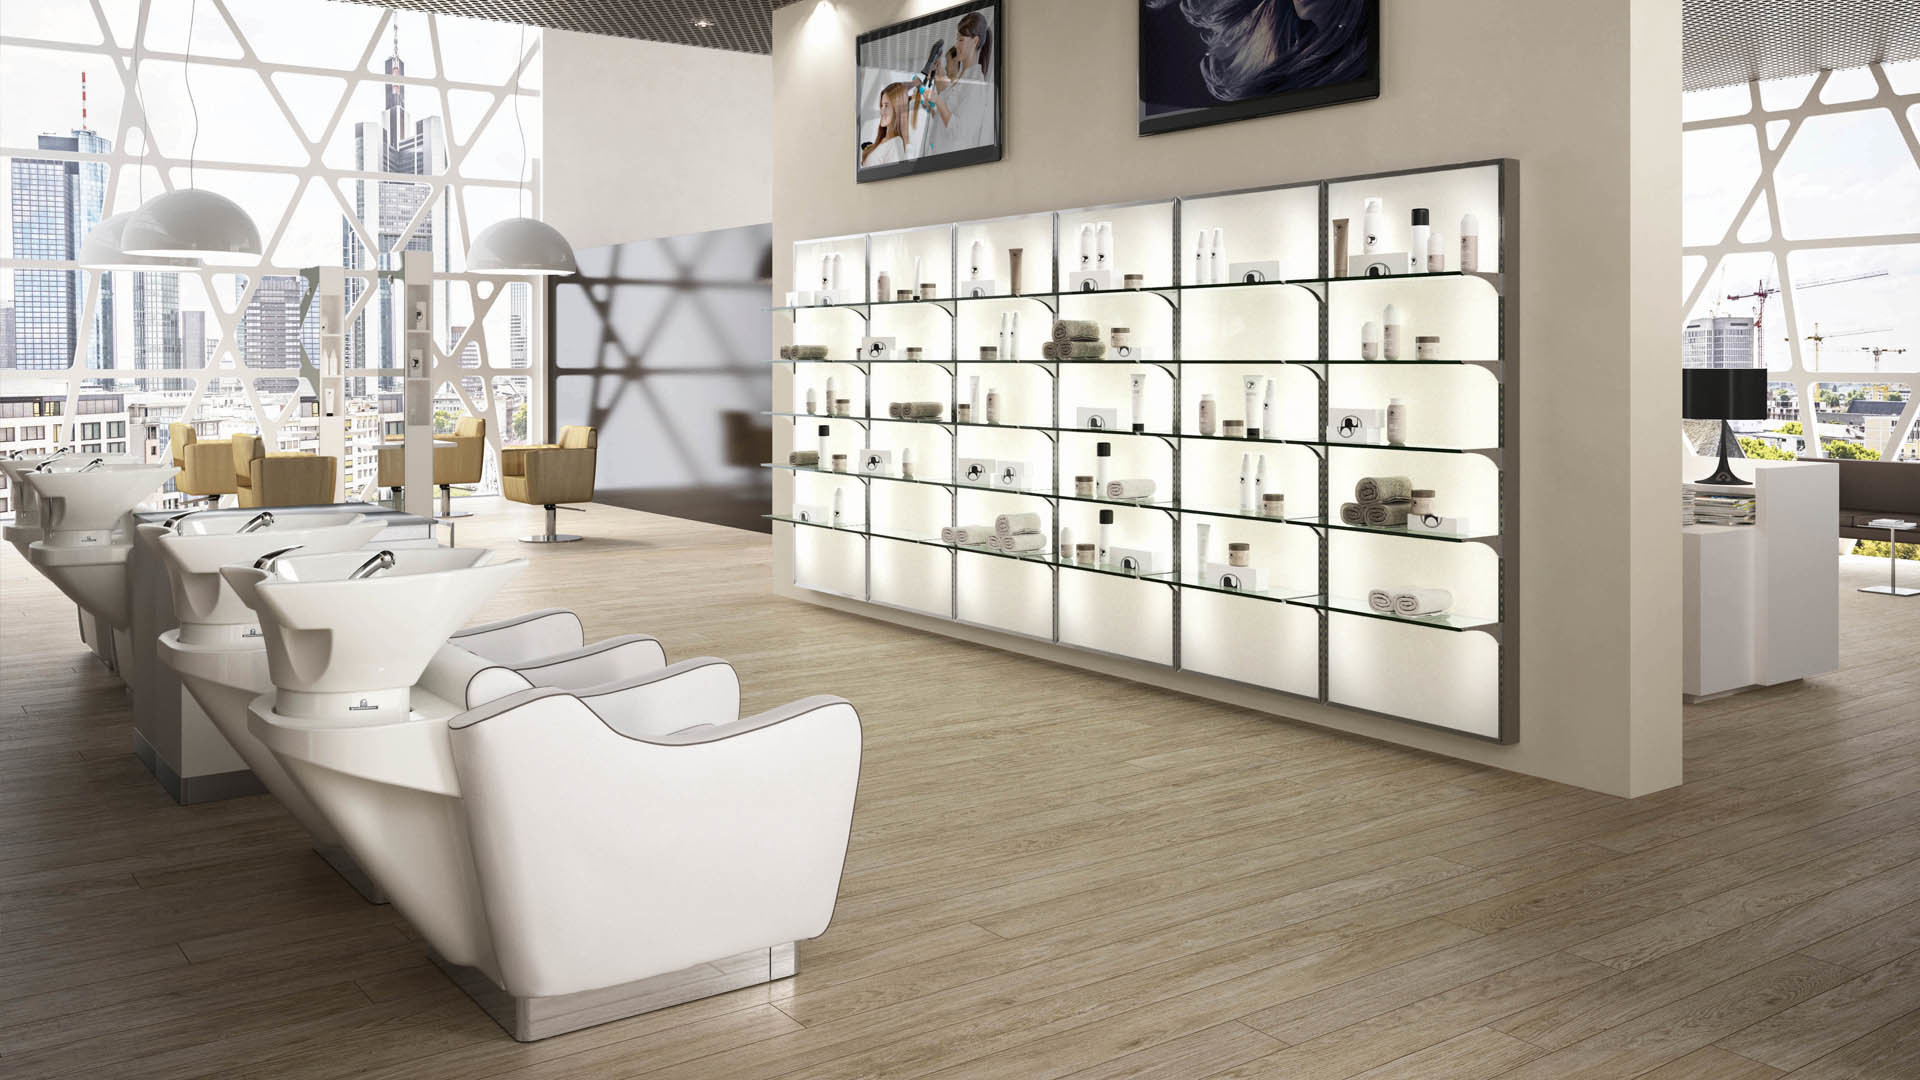 PIETRANERA SRL- Salon Equipment, Hairdressing Furniture Made ...